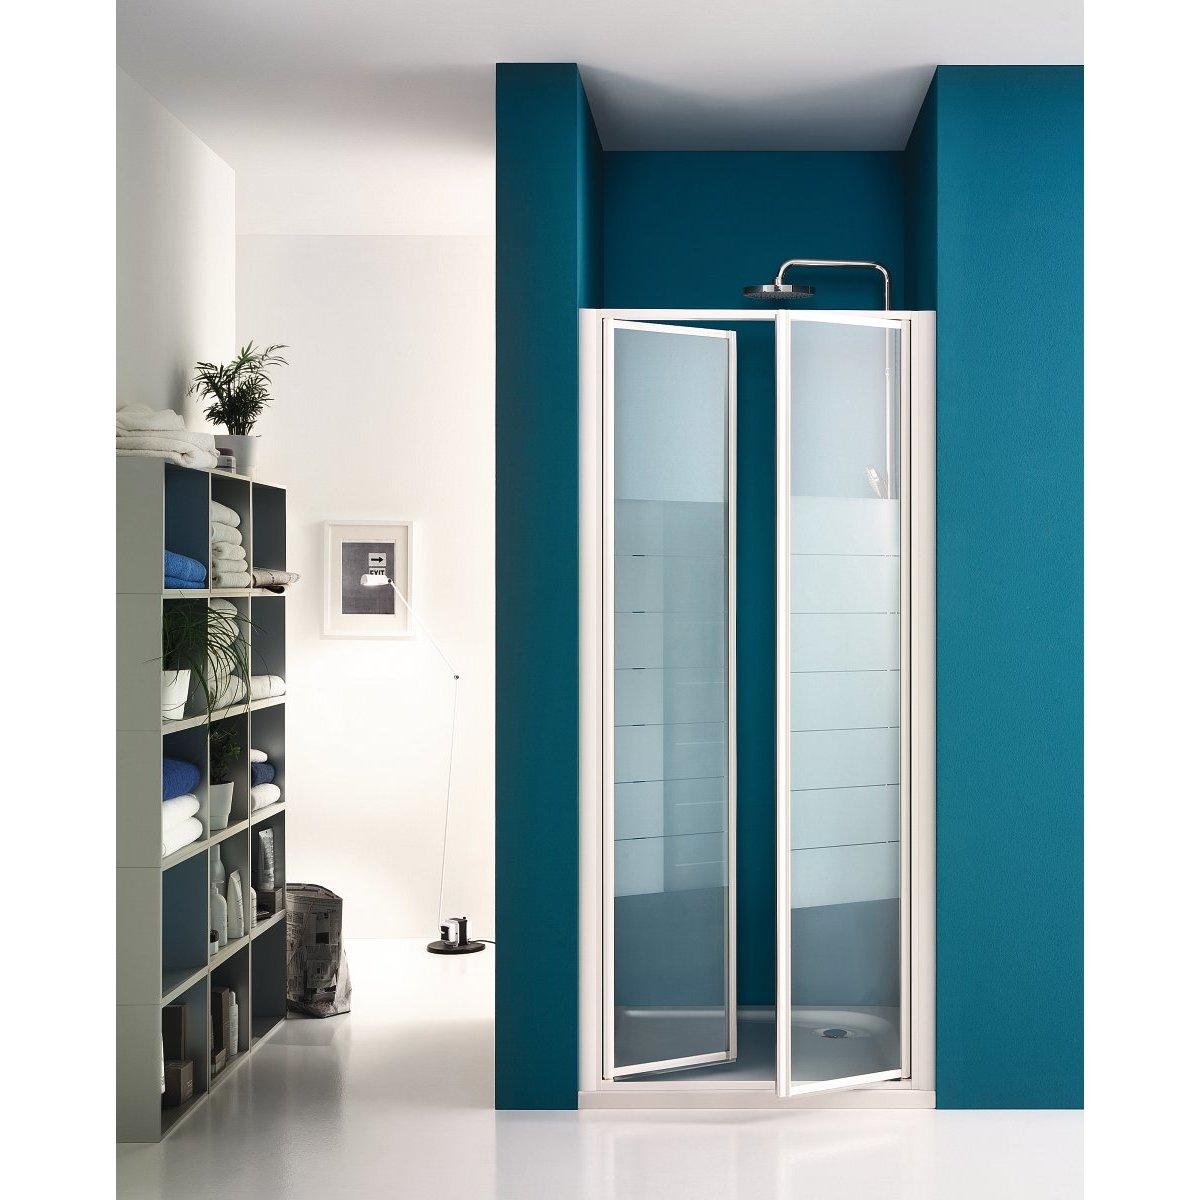 paroi douche serigraphie maison design. Black Bedroom Furniture Sets. Home Design Ideas